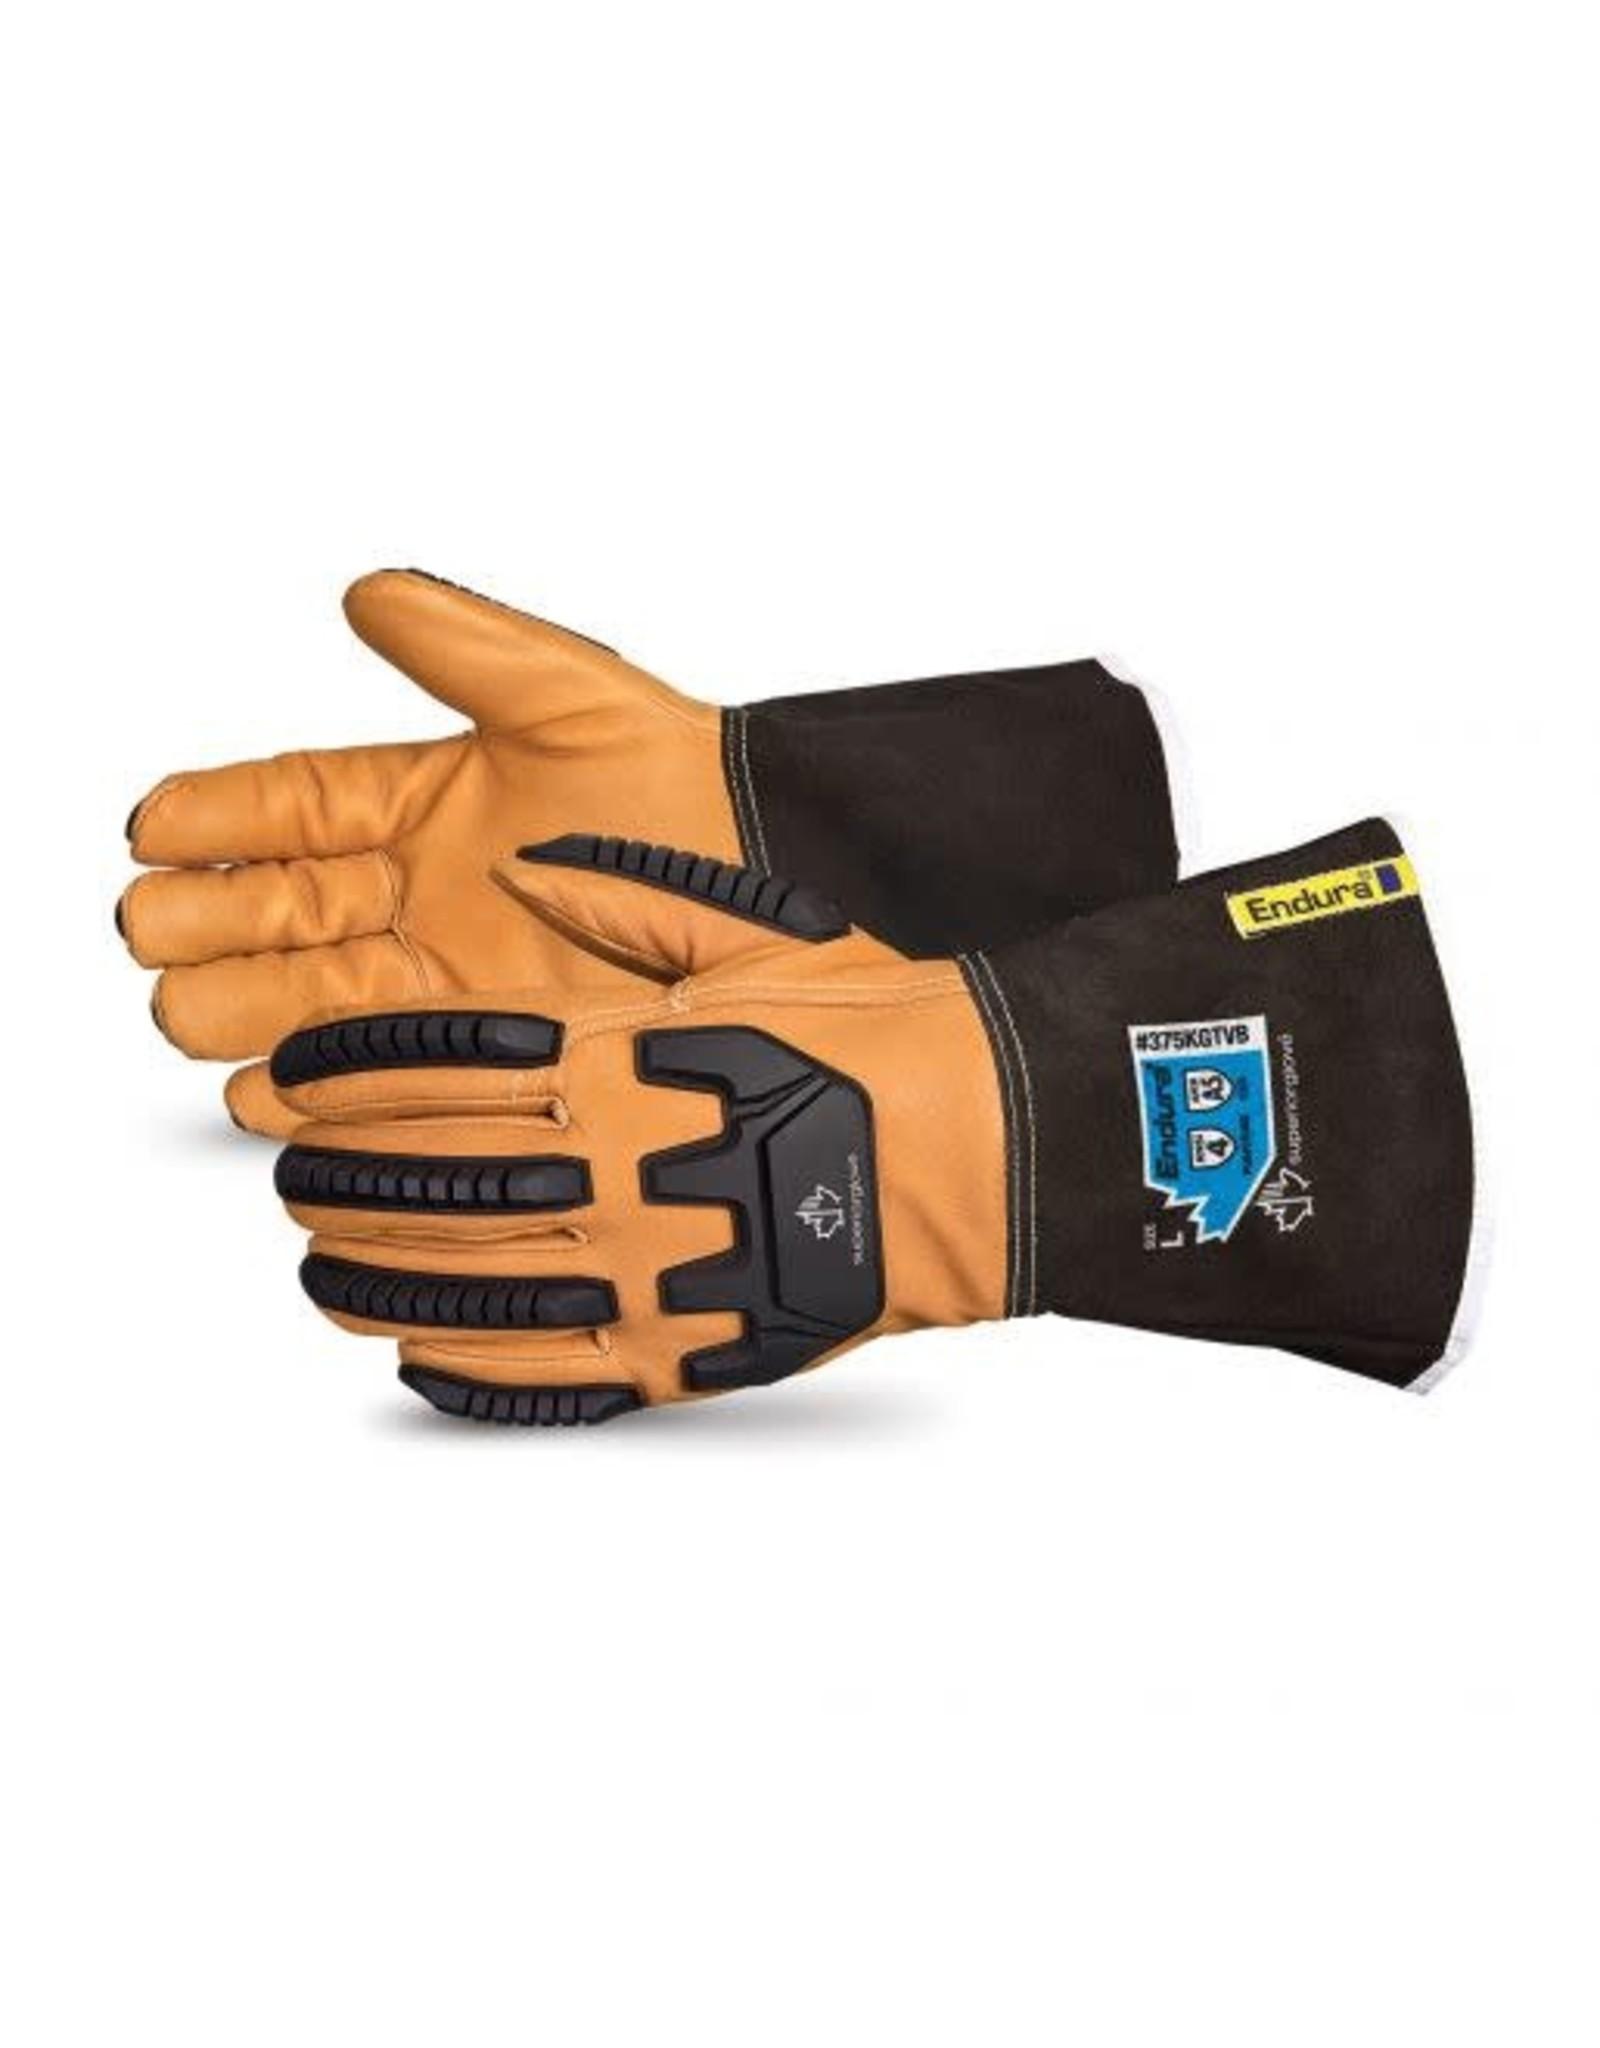 Superior Glove Superior Glove Endura Kevlar - Lined Winter Impact-Resistant Goatskin Drive Glove w/ Oilbloc